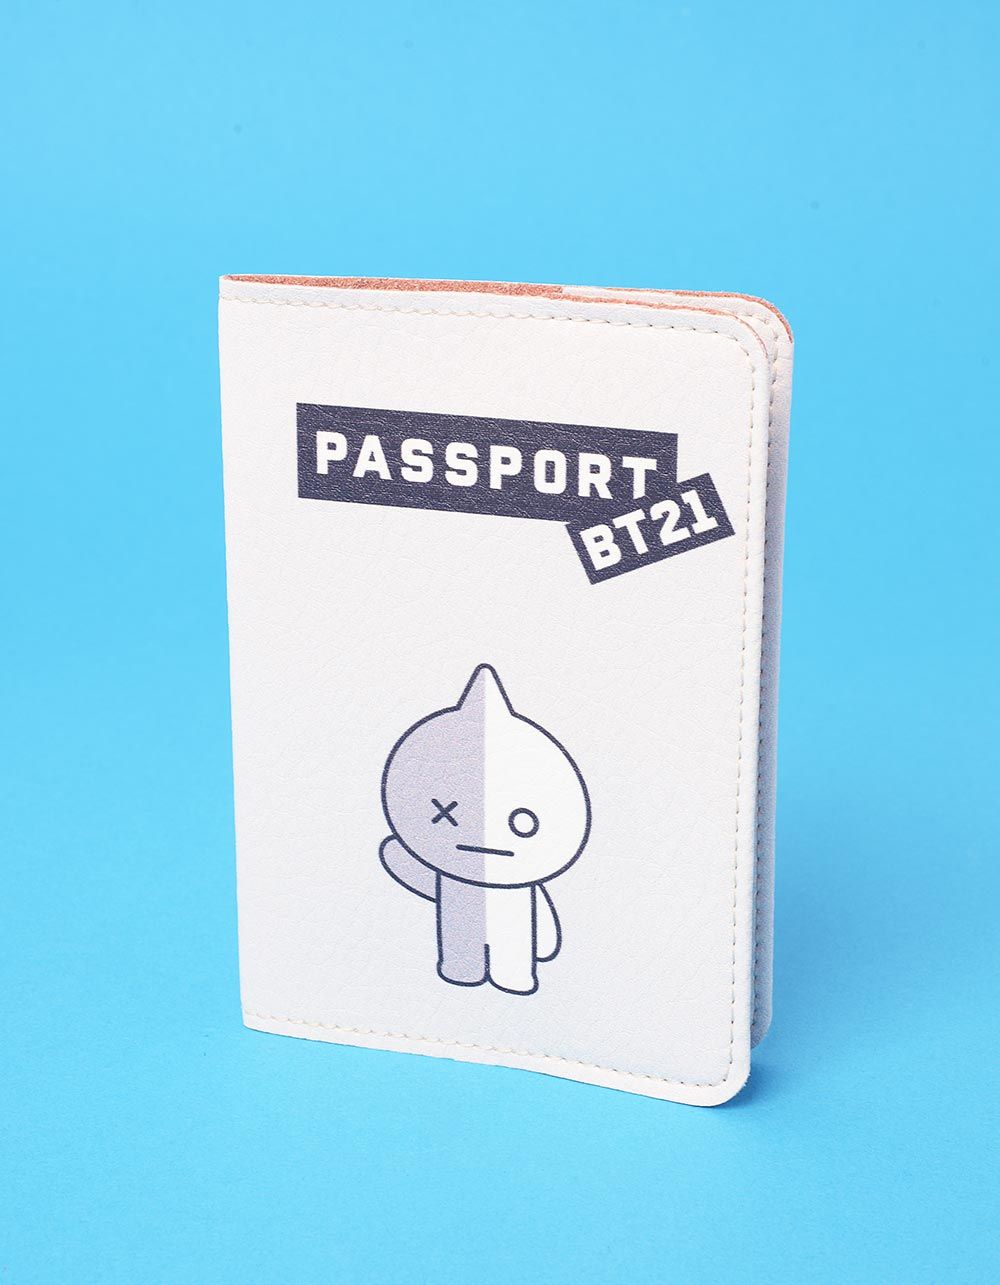 Обкладинка на паспорт з bts bt21 | 237247-11-XX